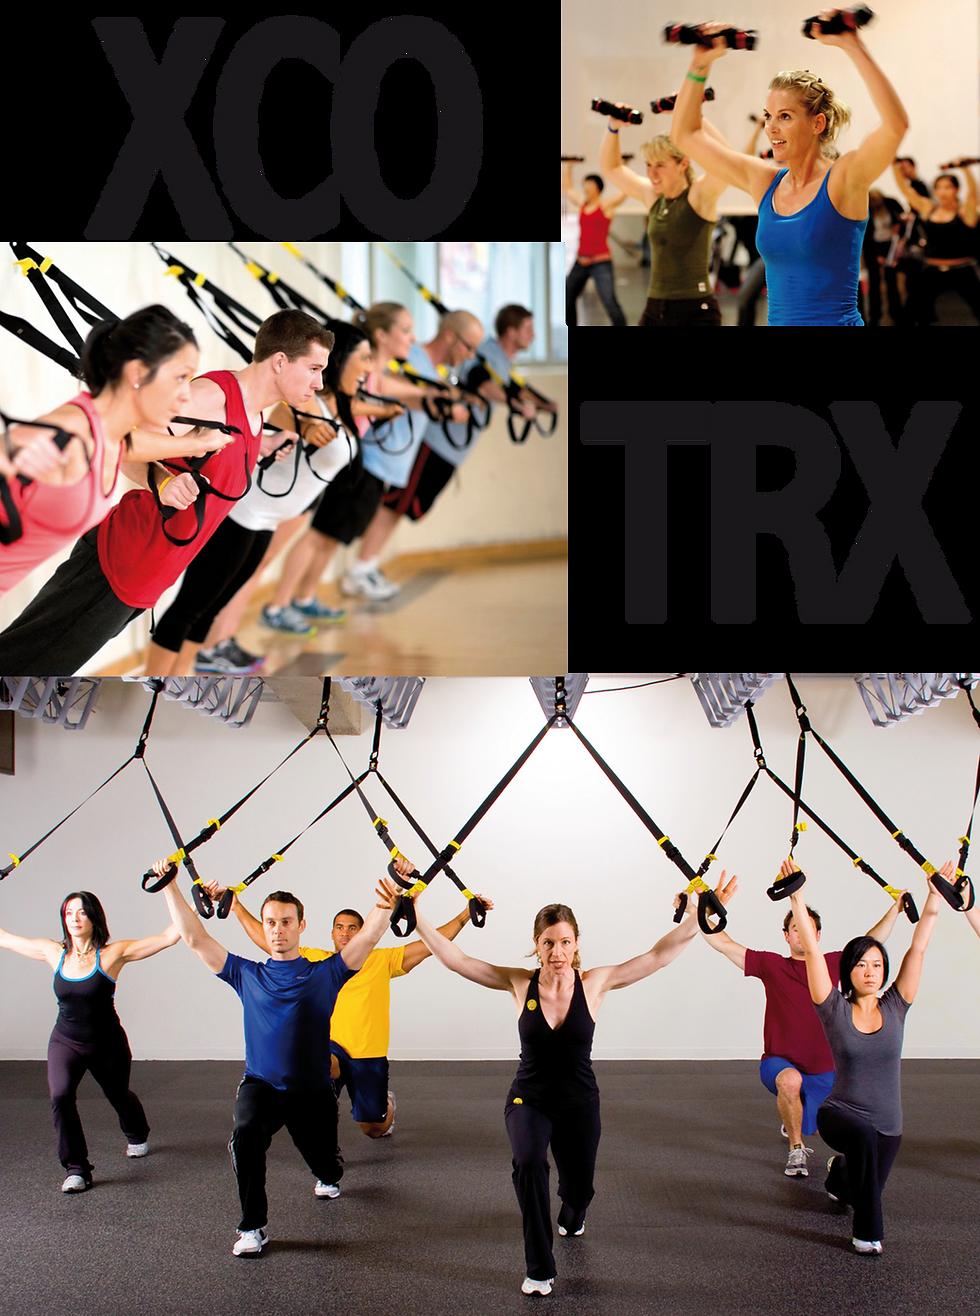 Fitness, Gymnastik, Personaltraining, TRX, XOC, Bodystyling, Bootcamp, FIT MIT KIND, Pilates, Wirbelsäule, Black Roll, Faszientraining, Stretching, Yoga, Gröbenzell, Puchheim, Eichenau, Lochhausen, Untermenzing